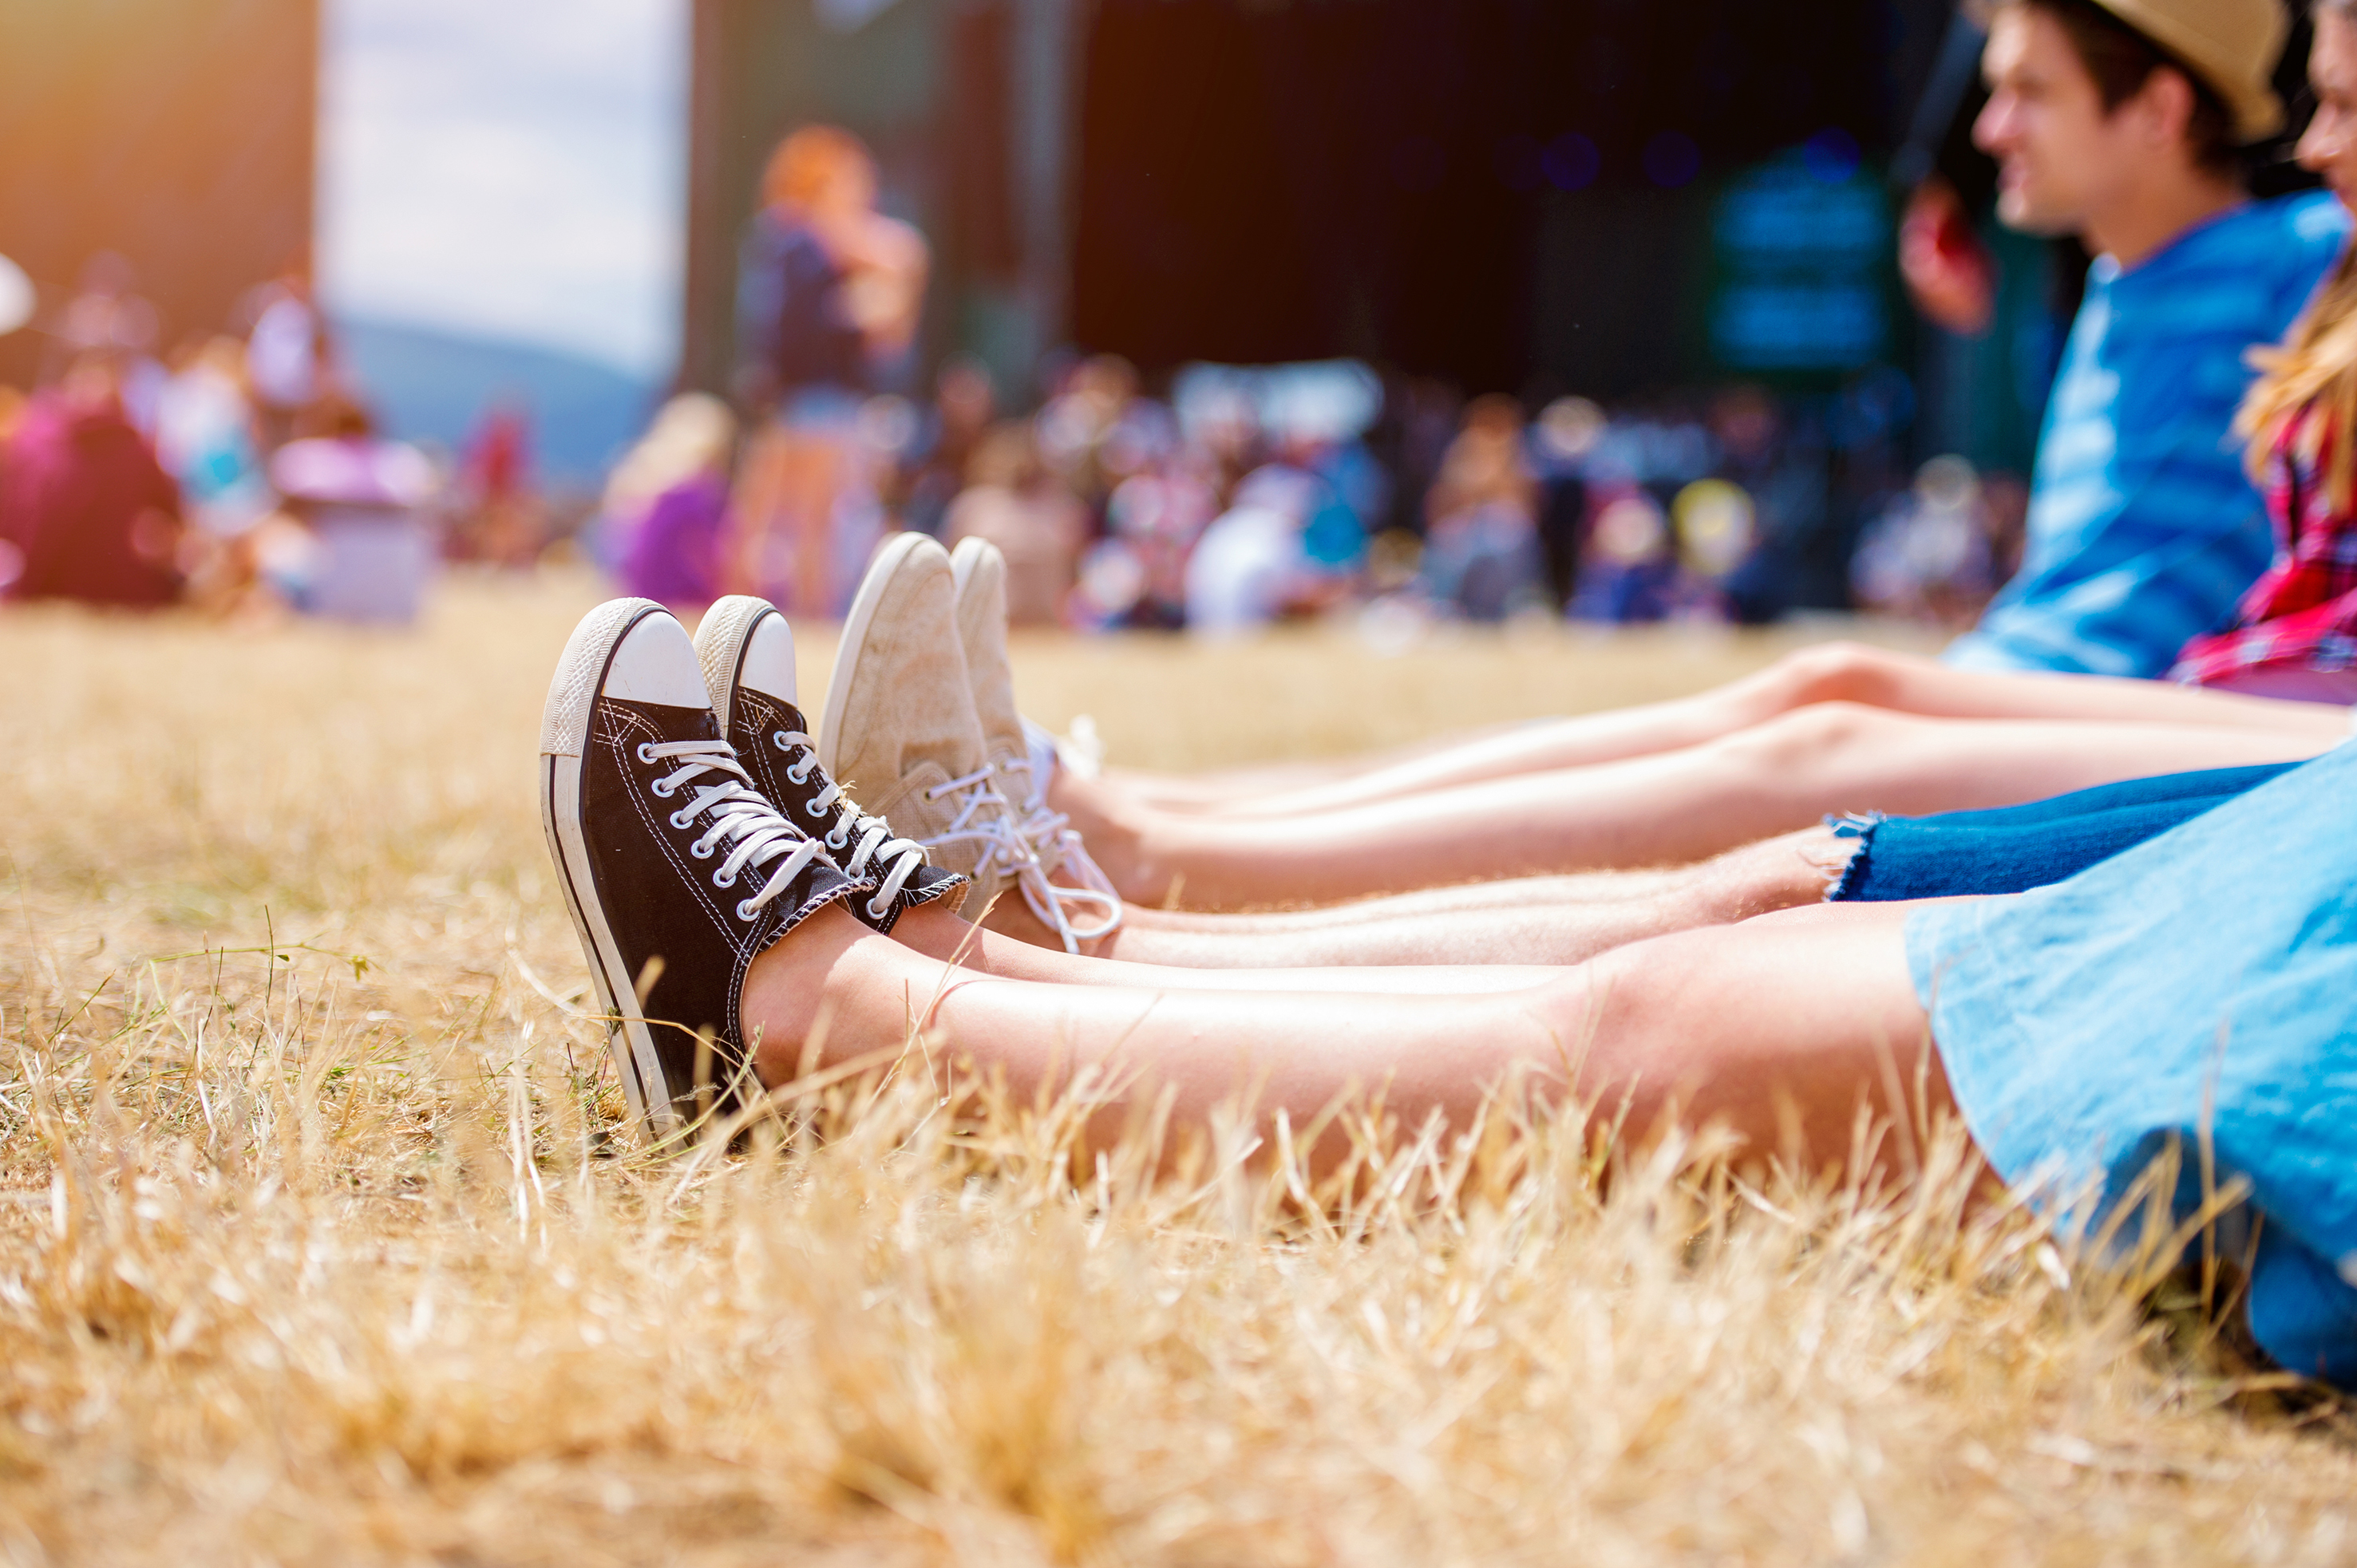 Bildcredit: Get long legs